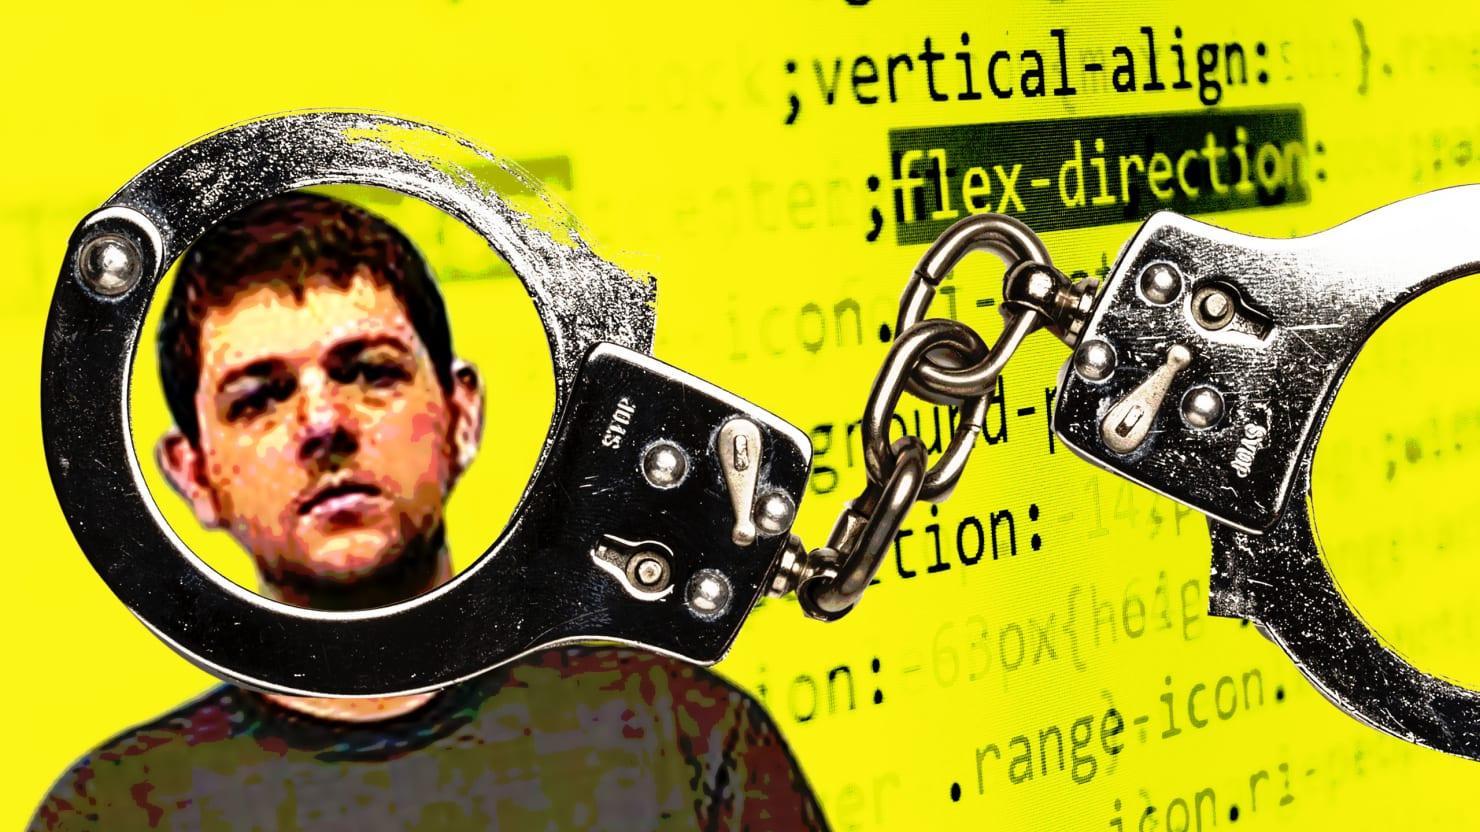 FBI Arrests Hacker Who Hacked No One